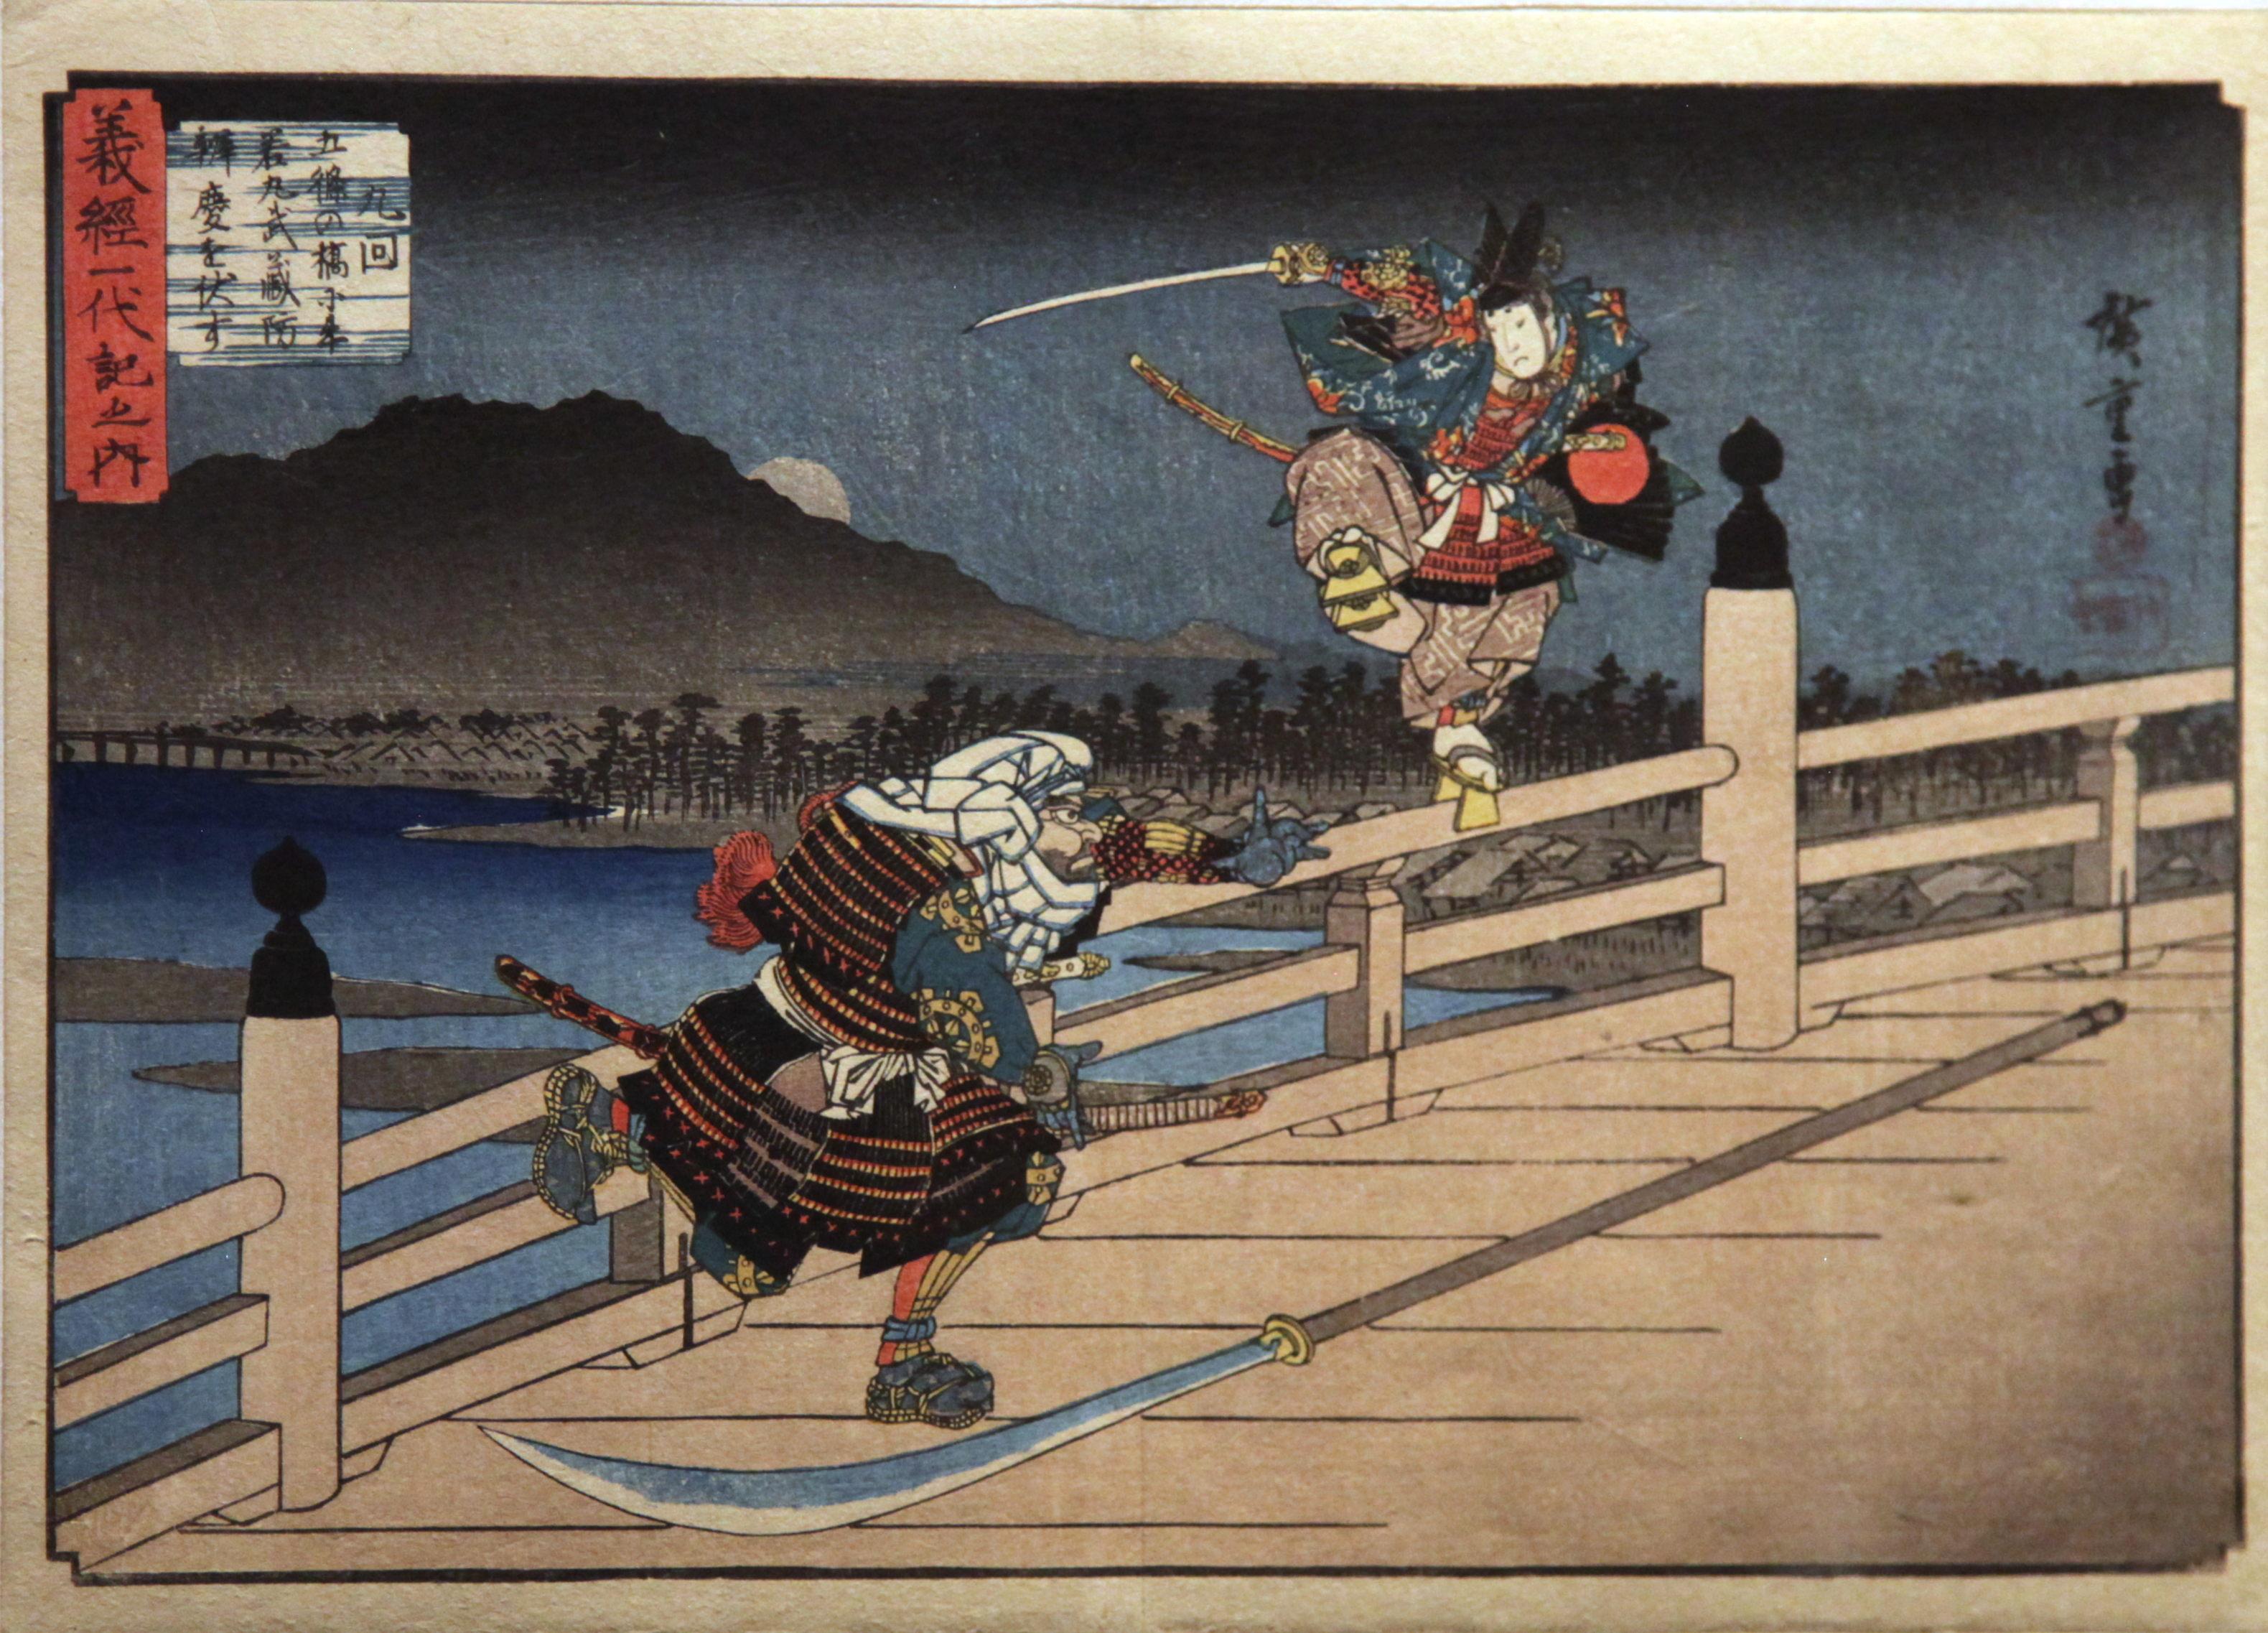 File Fight Of Ushiwakamaru And Benkei At Gojo Bridge Near Kyoto Img 9288 Jpg Wikimedia Commons Benkei hanawa (花輪ベンケイ / 花輪弁慶, hanawa benkei ) is one of the main characters in the metal saga, first appearing in beyblade: https commons wikimedia org wiki file fight of ushiwakamaru and benkei at gojo bridge near kyoto img 9288 jpg